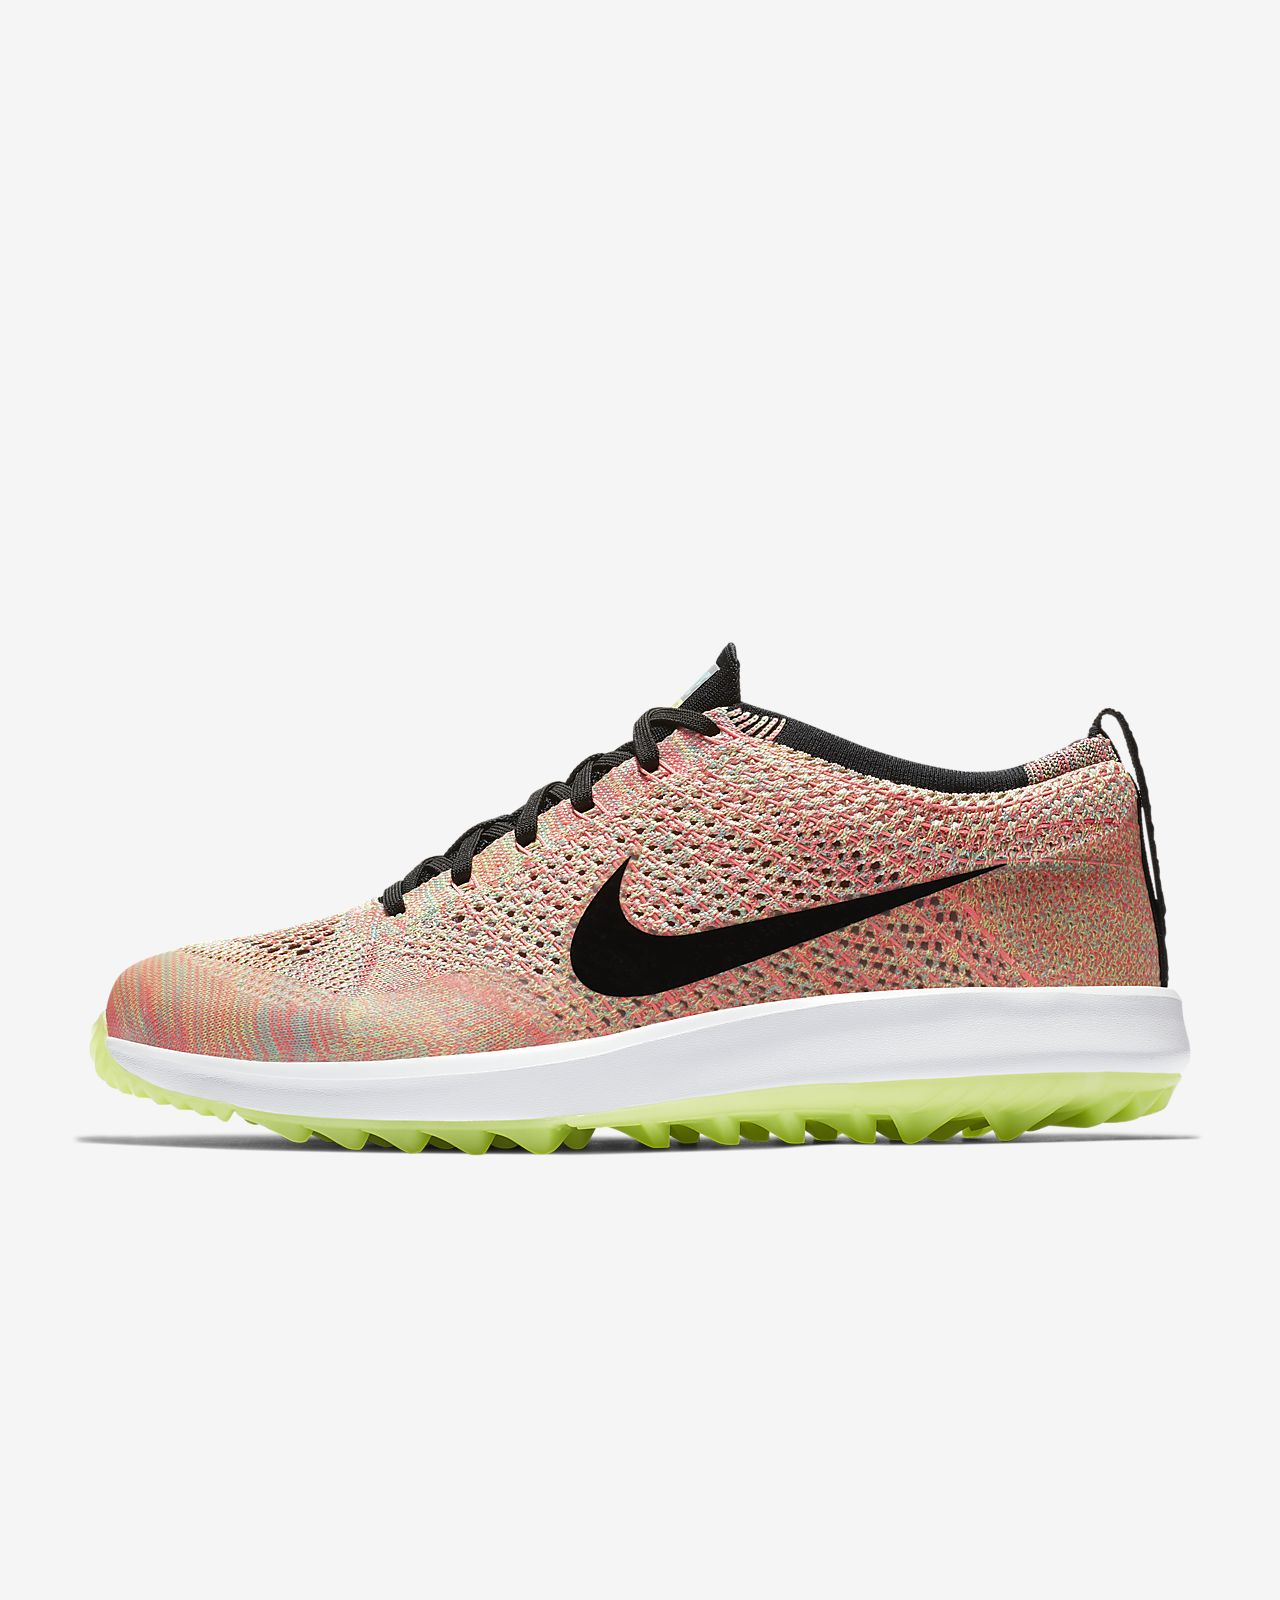 Nike Flyknit  Racer G Men's Golf Schuhe. Nike  Flyknit 1217ab